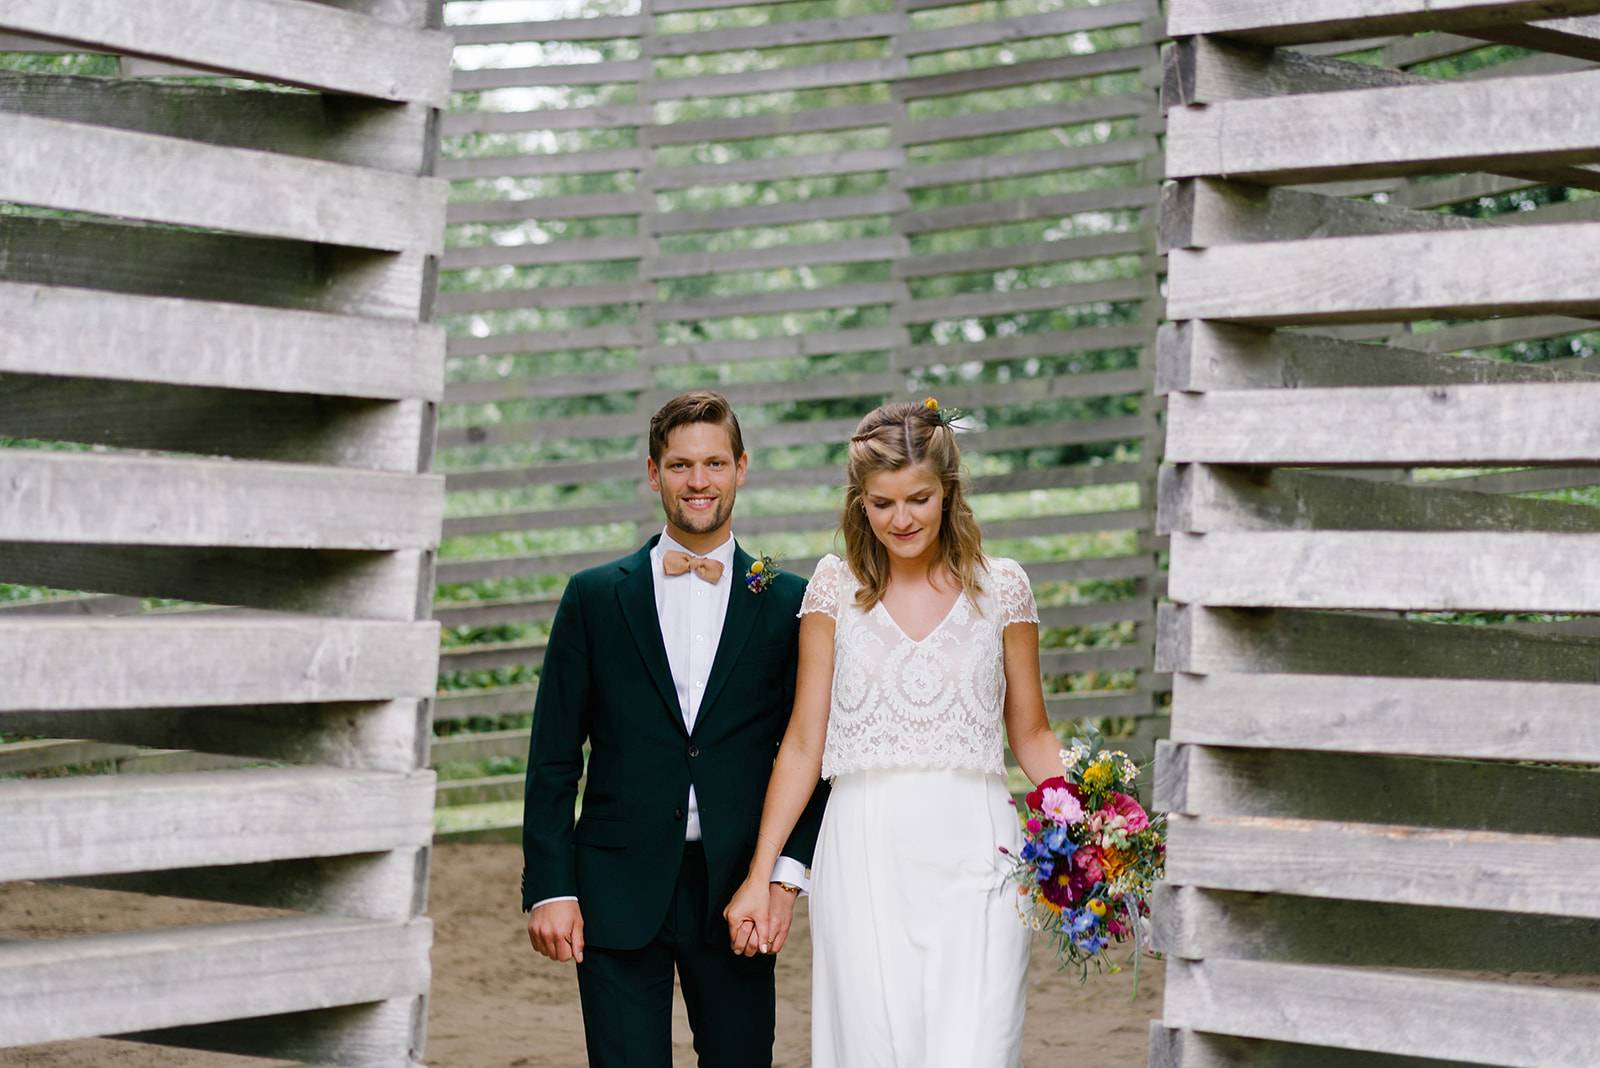 Hilde Eyckmans - MM-34 - House of Weddings